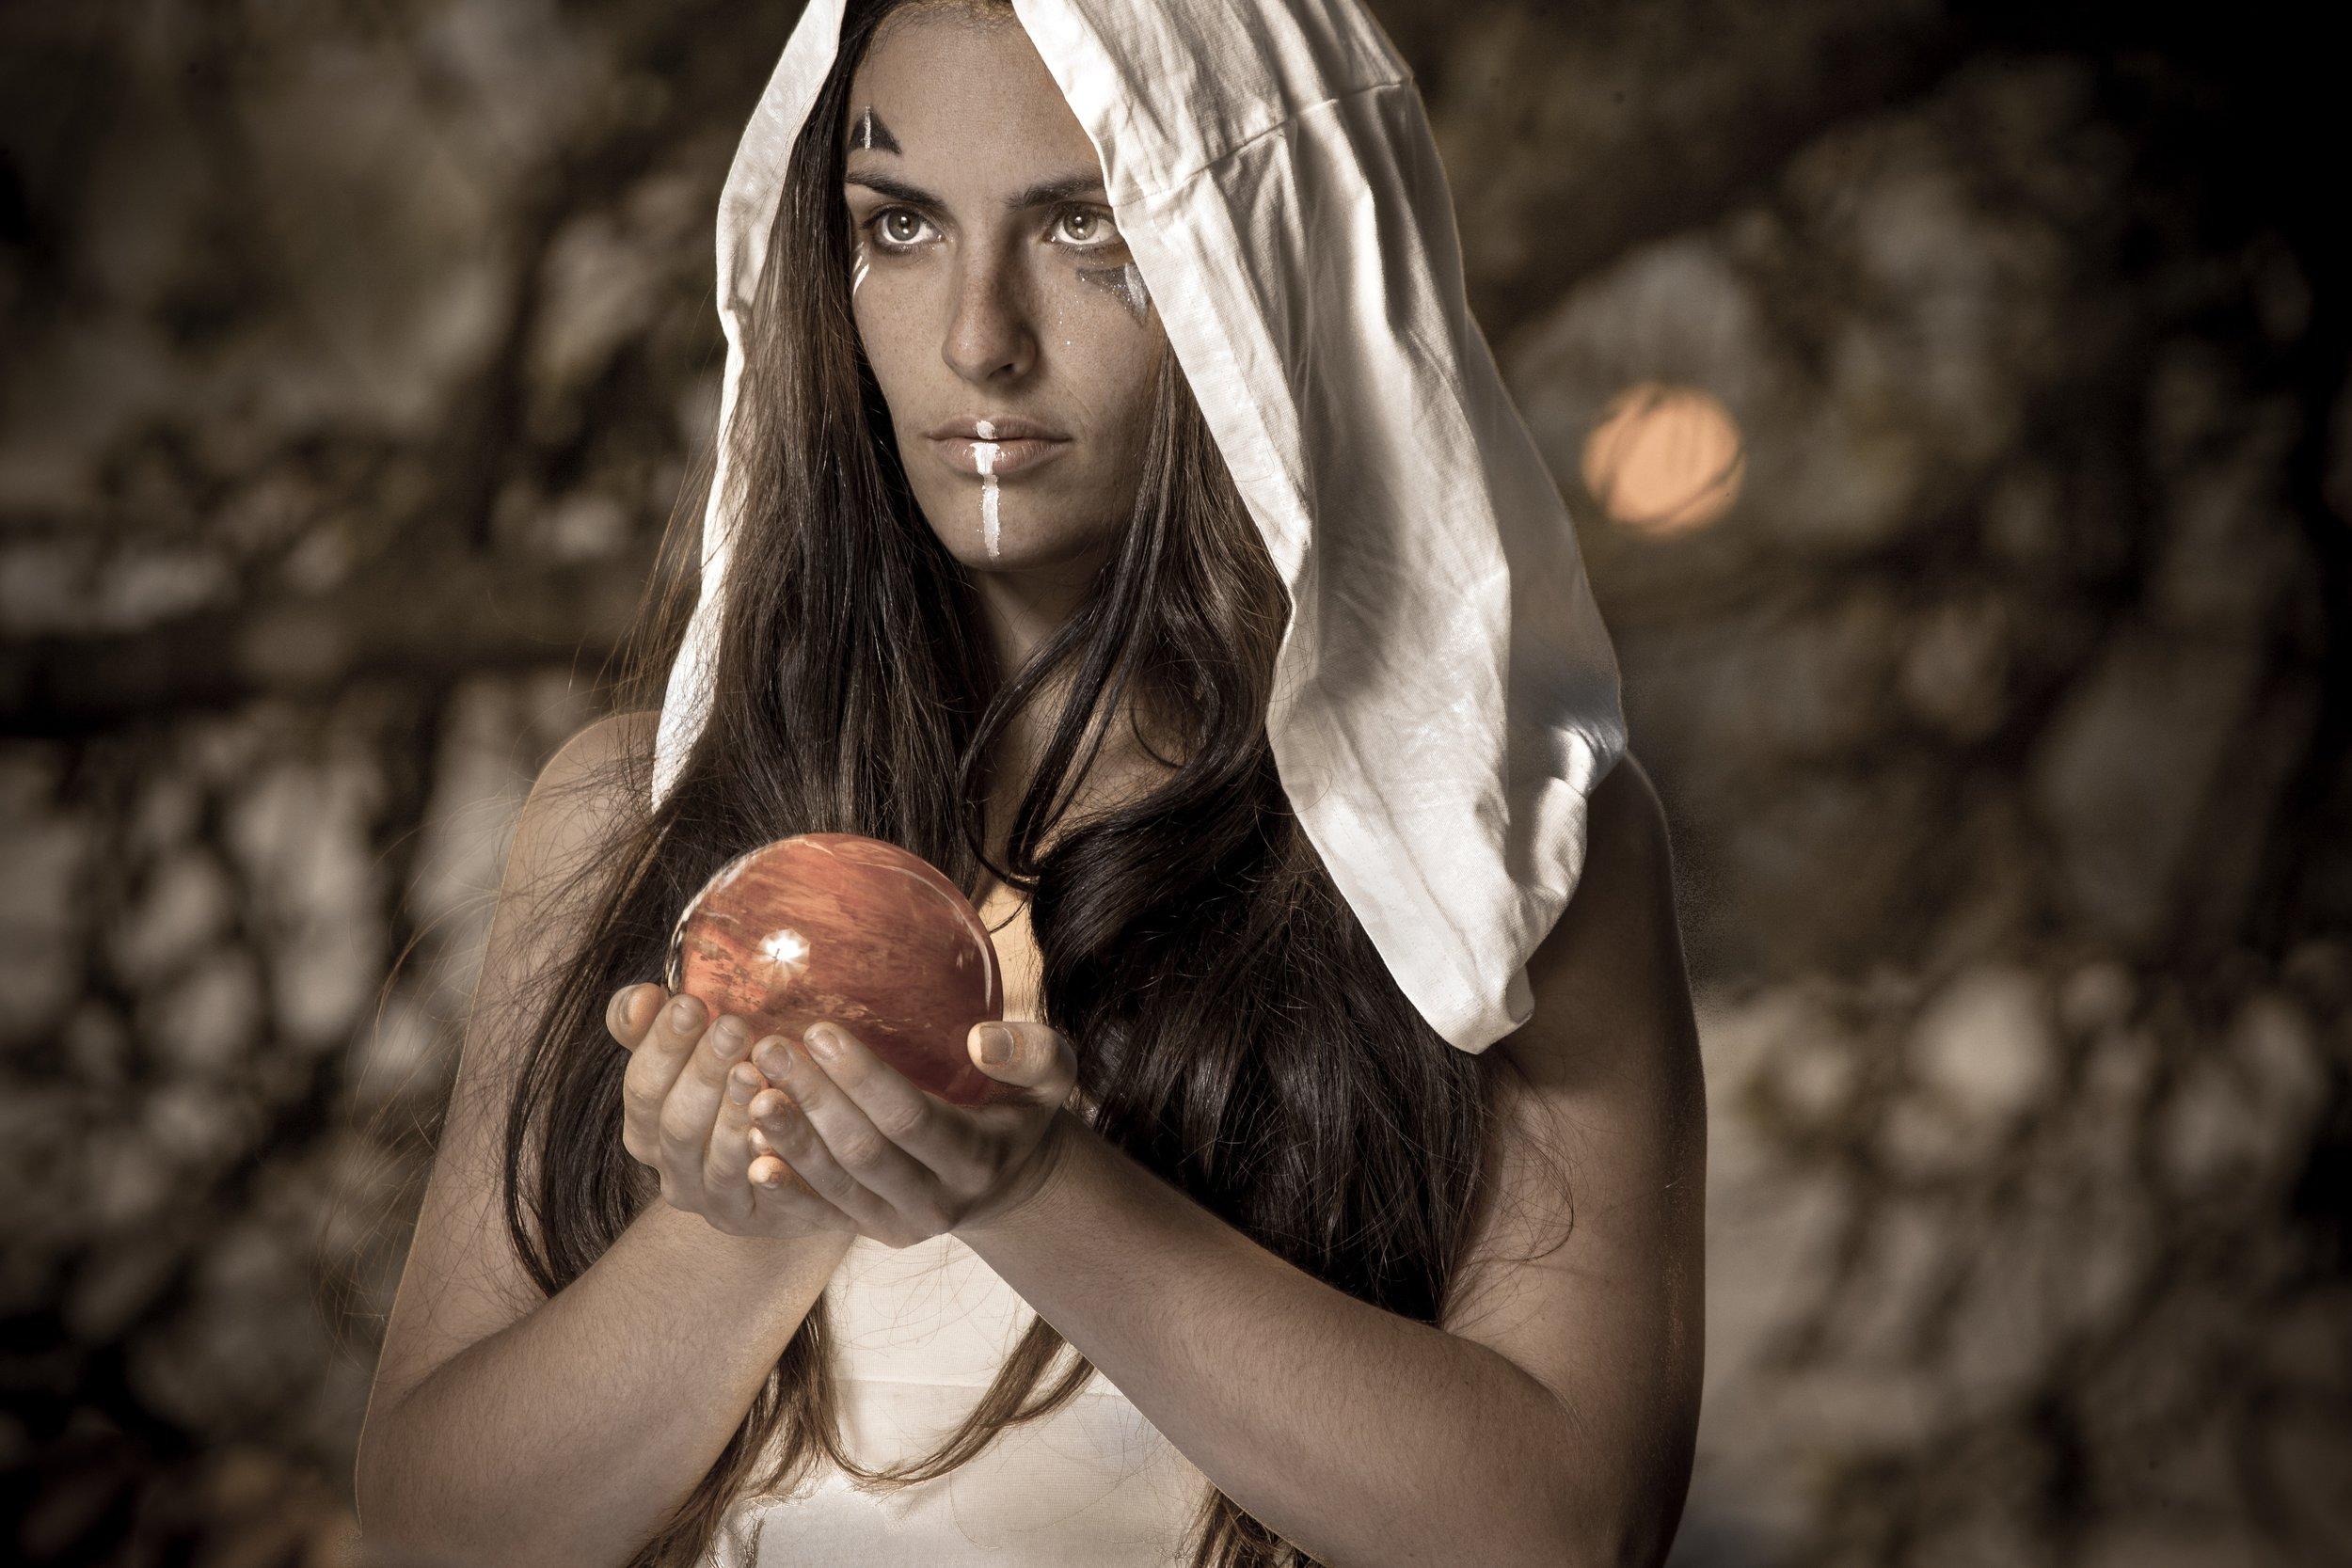 Marya_stark_blood_moon_eclispe_scarlet_ruby_sapphire_magic.jpg